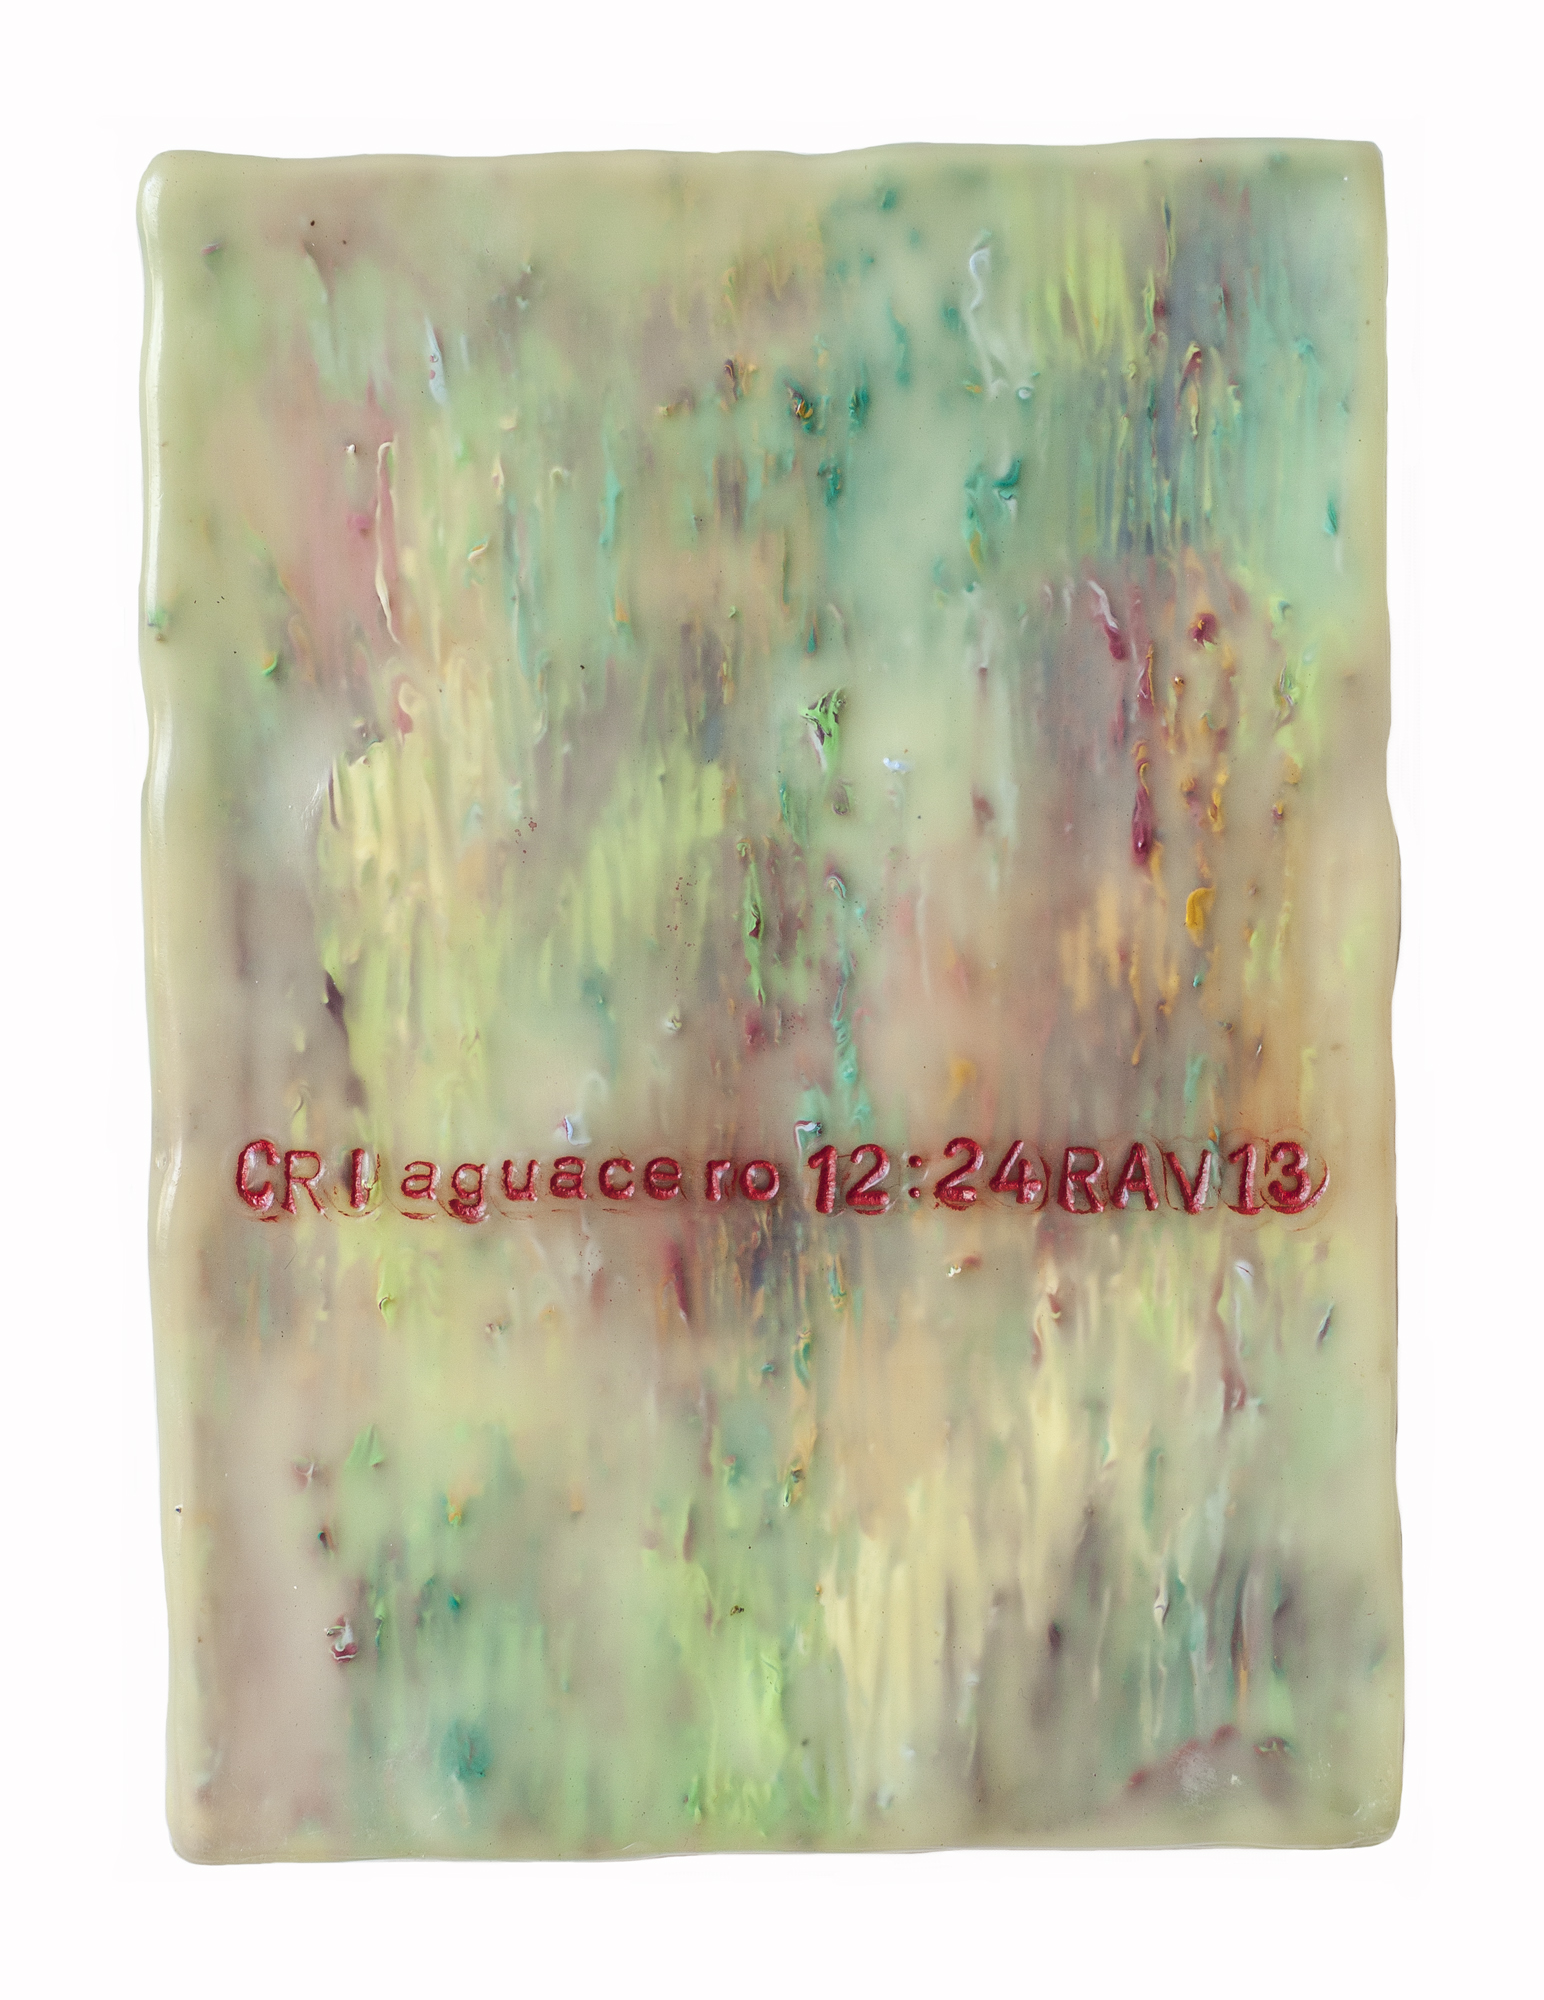 CRIaguacero12:24RAV13